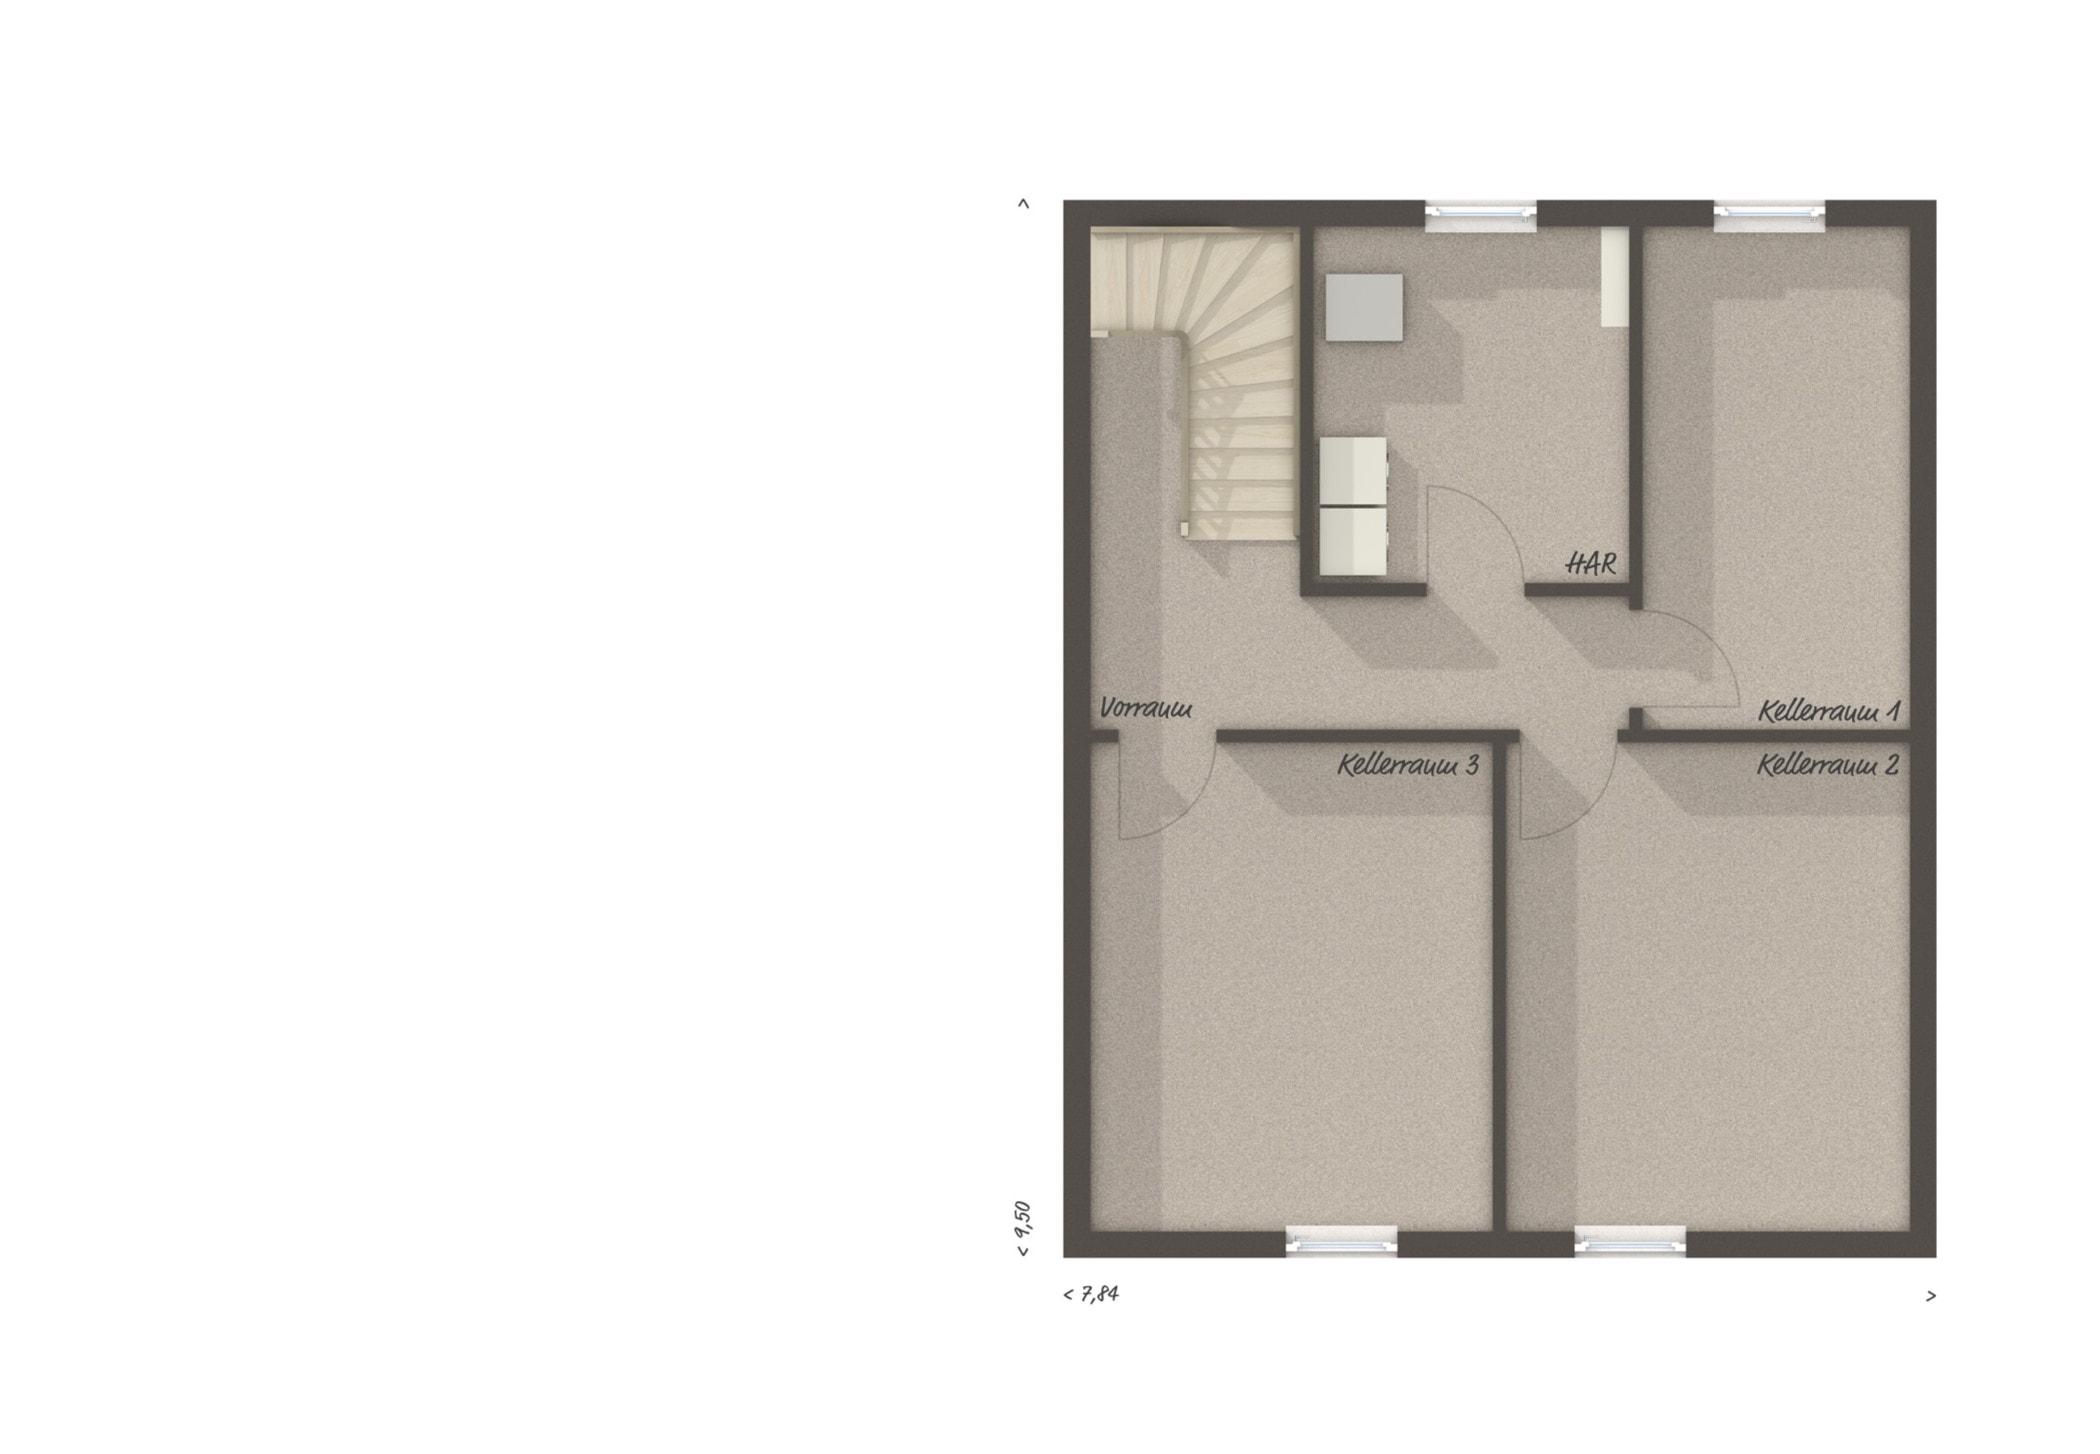 Bungalow Haus Grundriss Keller - Massivhaus bauen Ideen Town Country Haus Bungalow 131 - HausbauDirekt.de